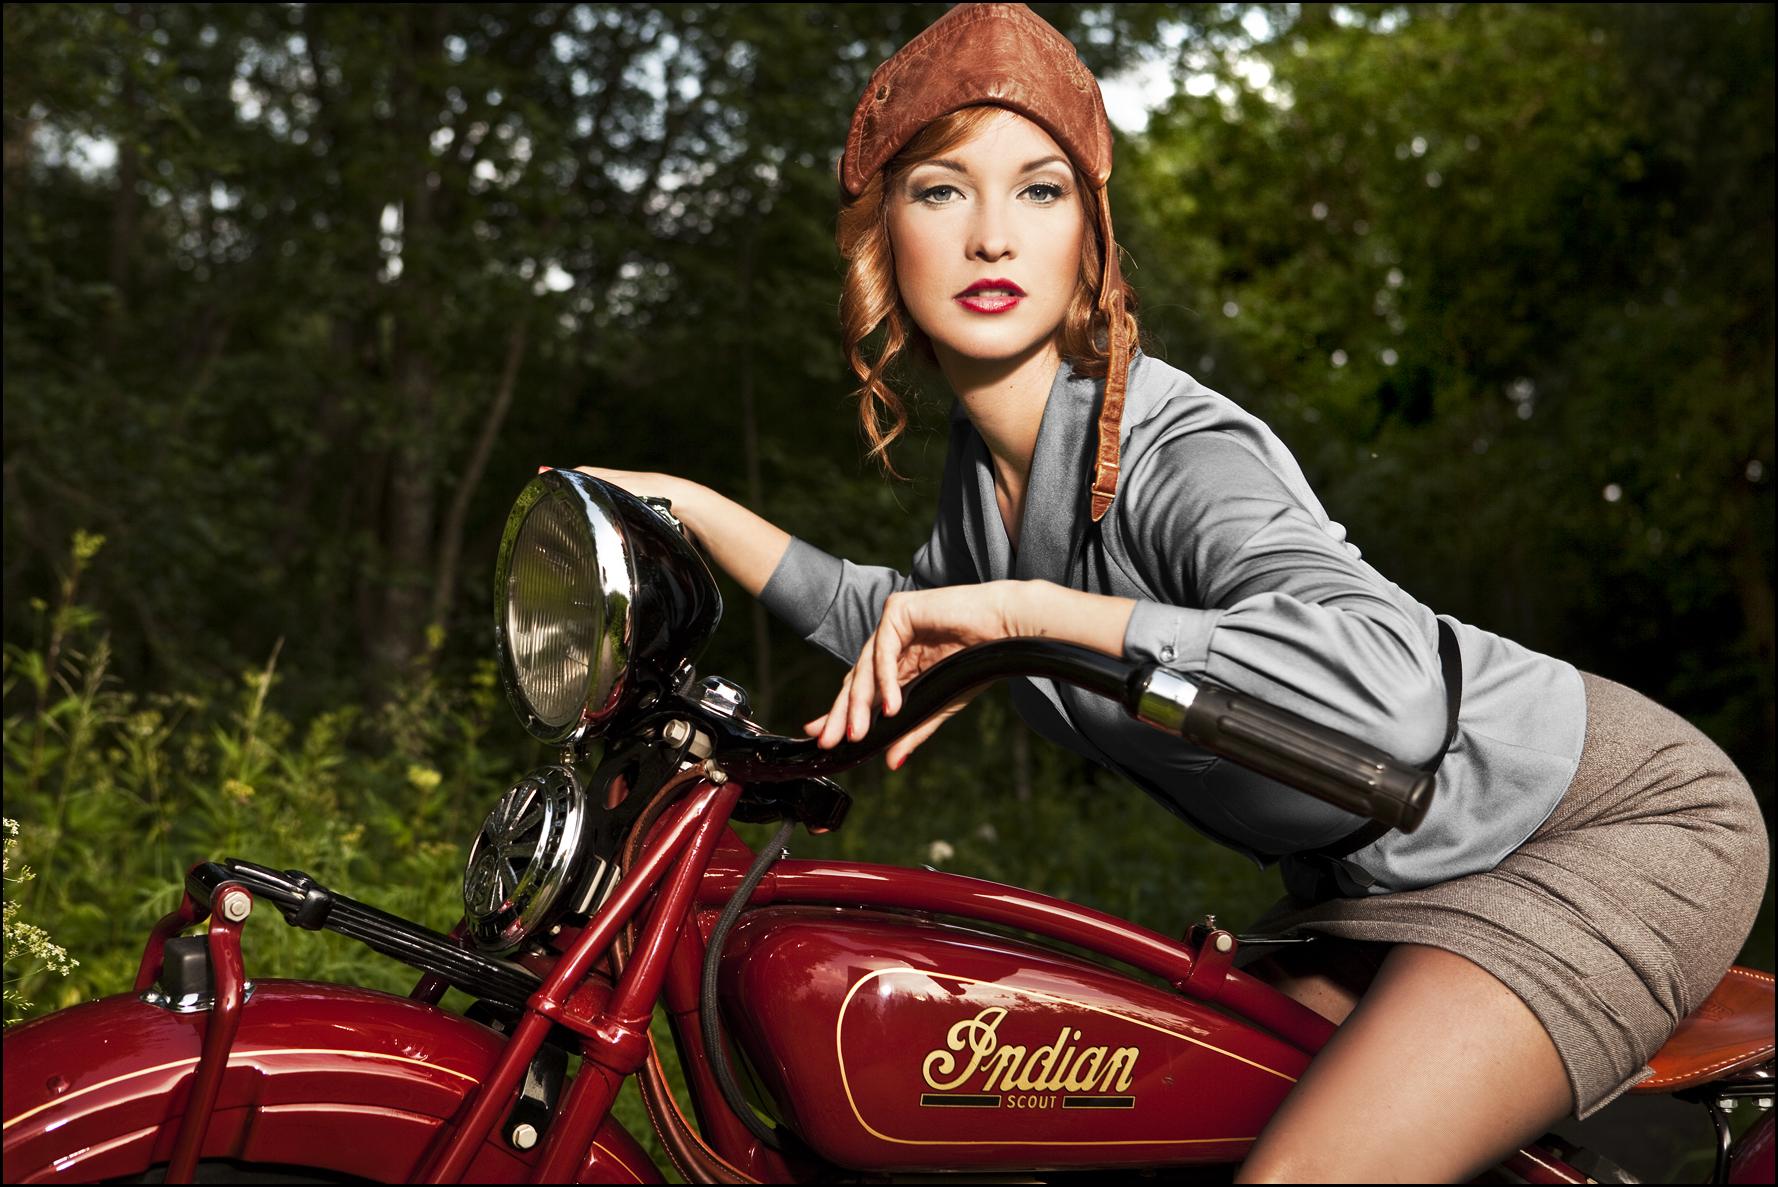 Hot Modern Pin Up Girls Youll Enjoy - Barnorama